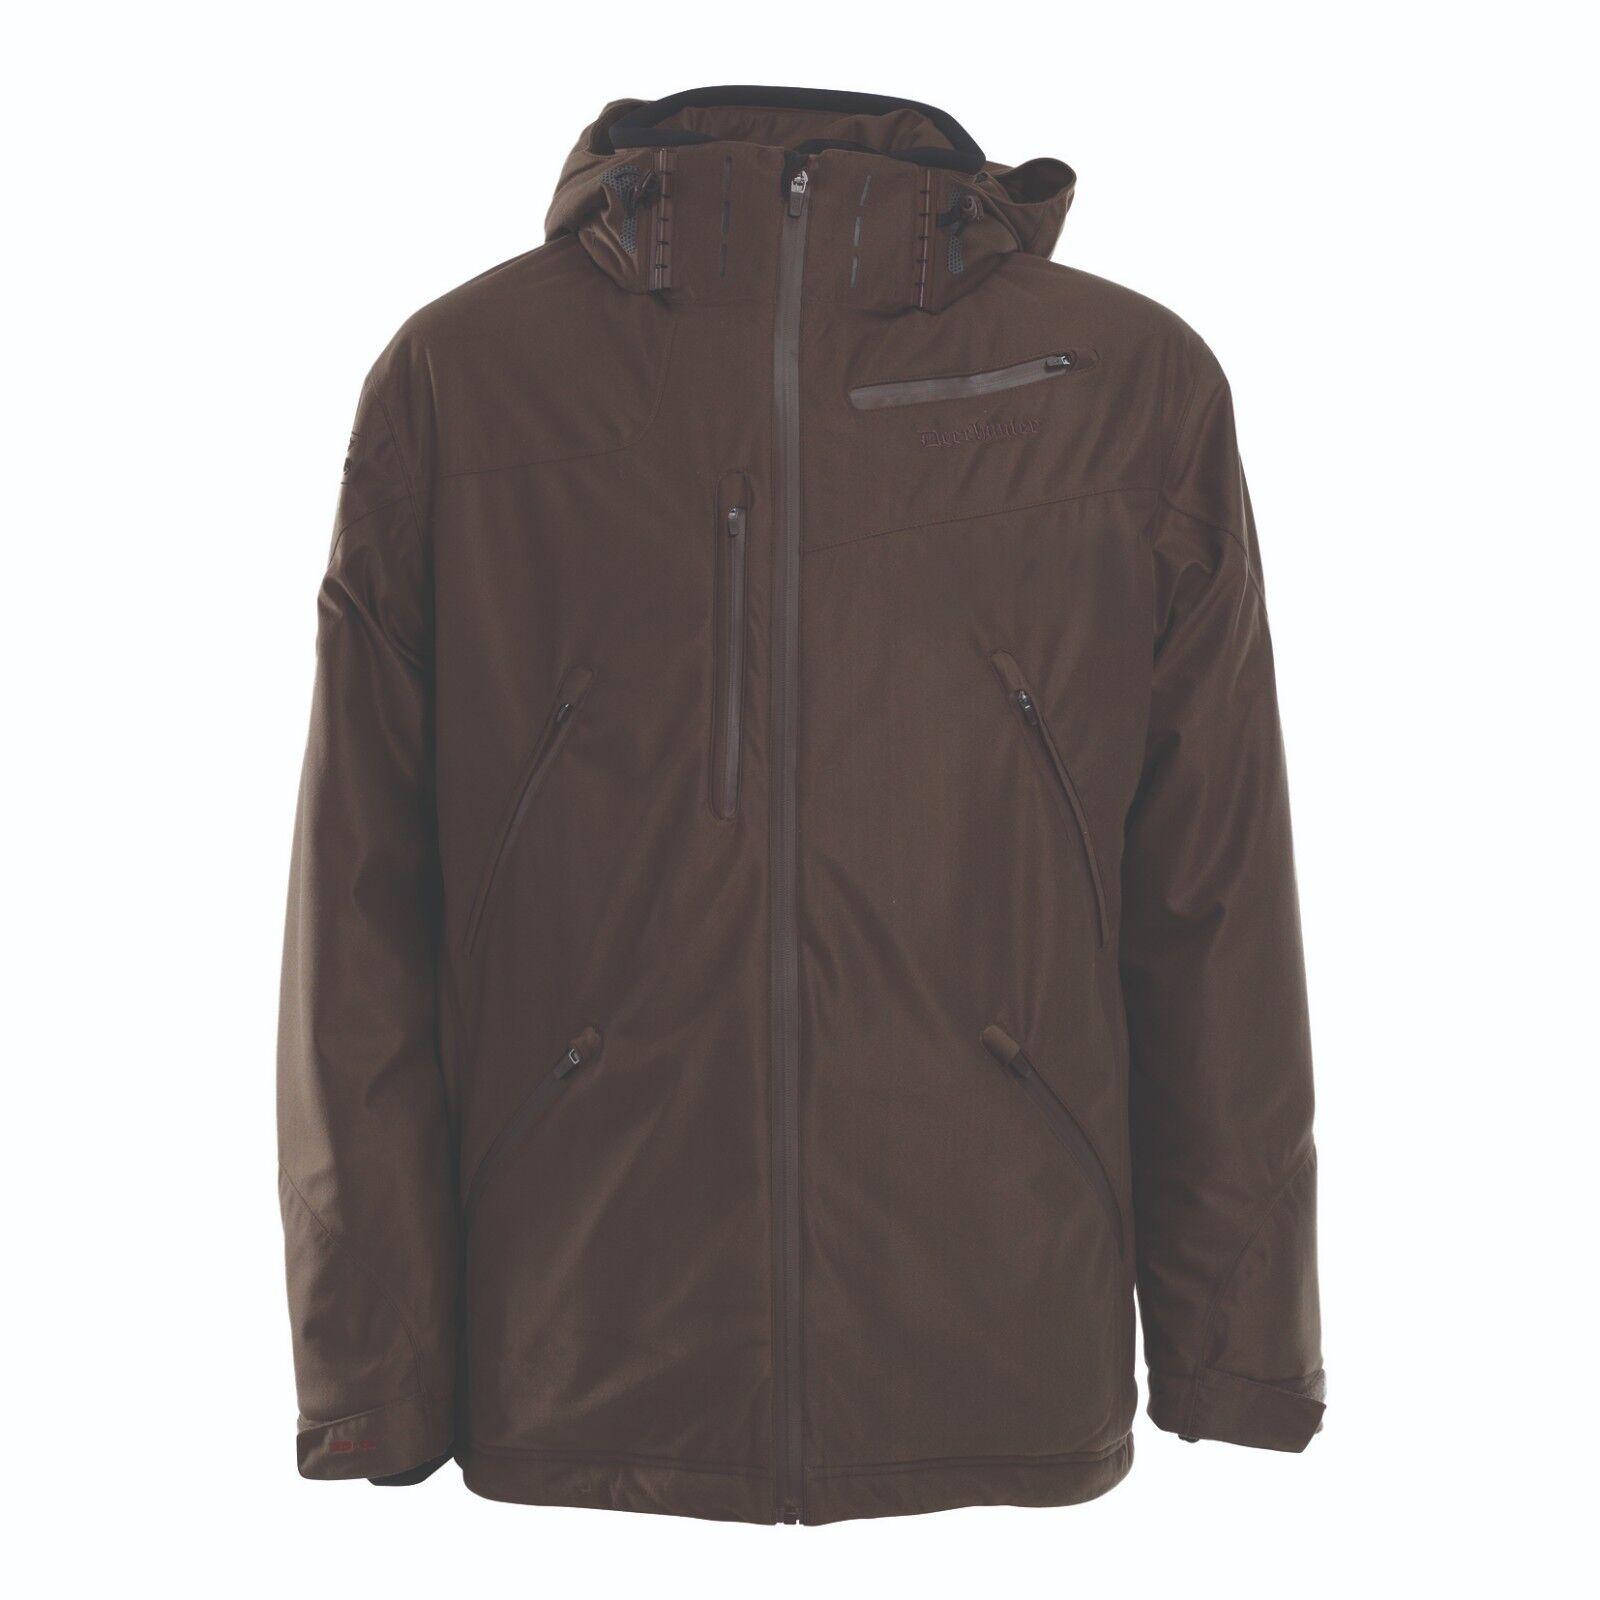 Deerhunter 5690  Blizzard chaqueta con thinsulate  383-Dark Elm, tamaño 4xl